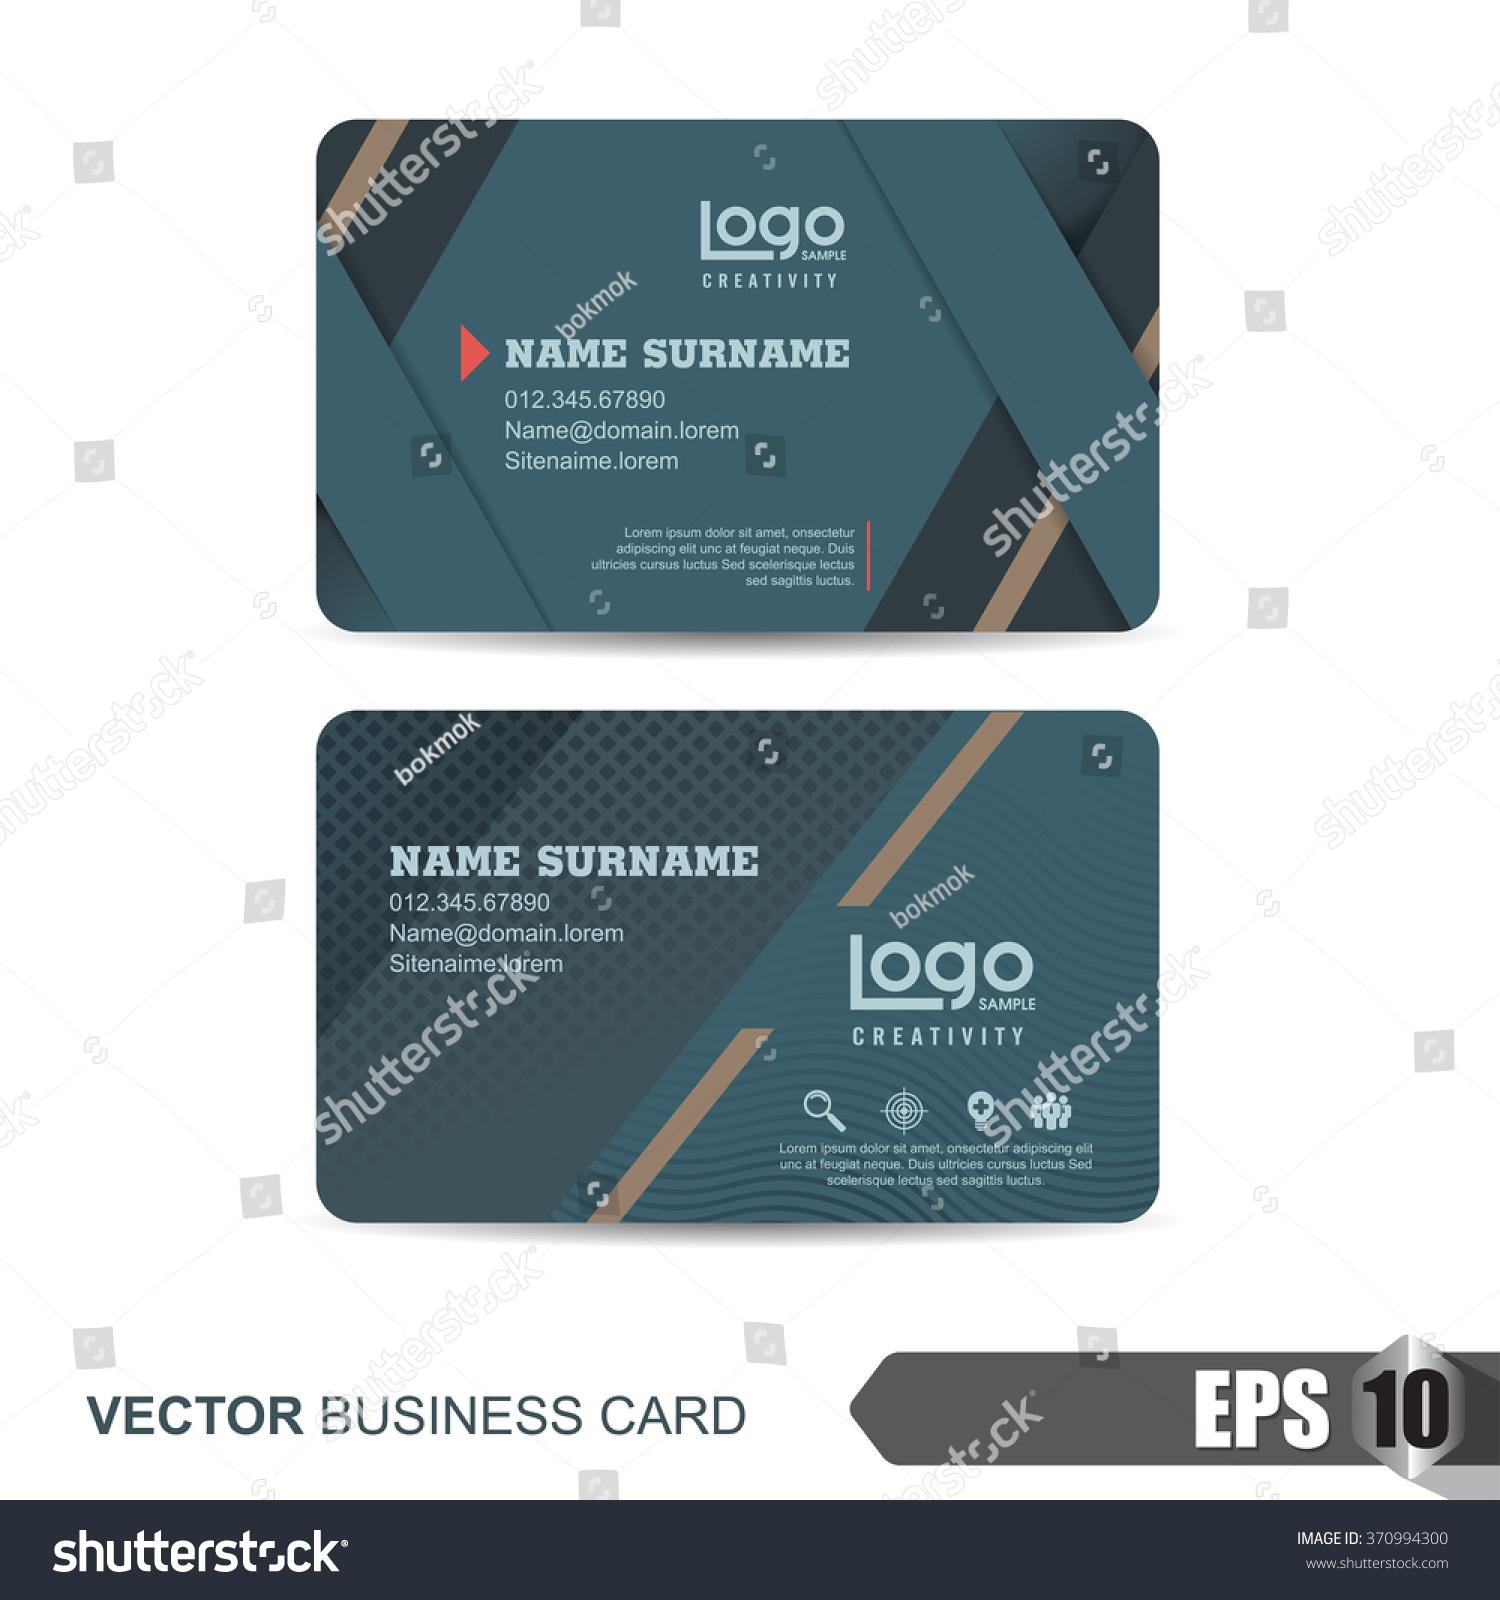 Business Card Templatevector Illustration Stock Vector 370994300 ...